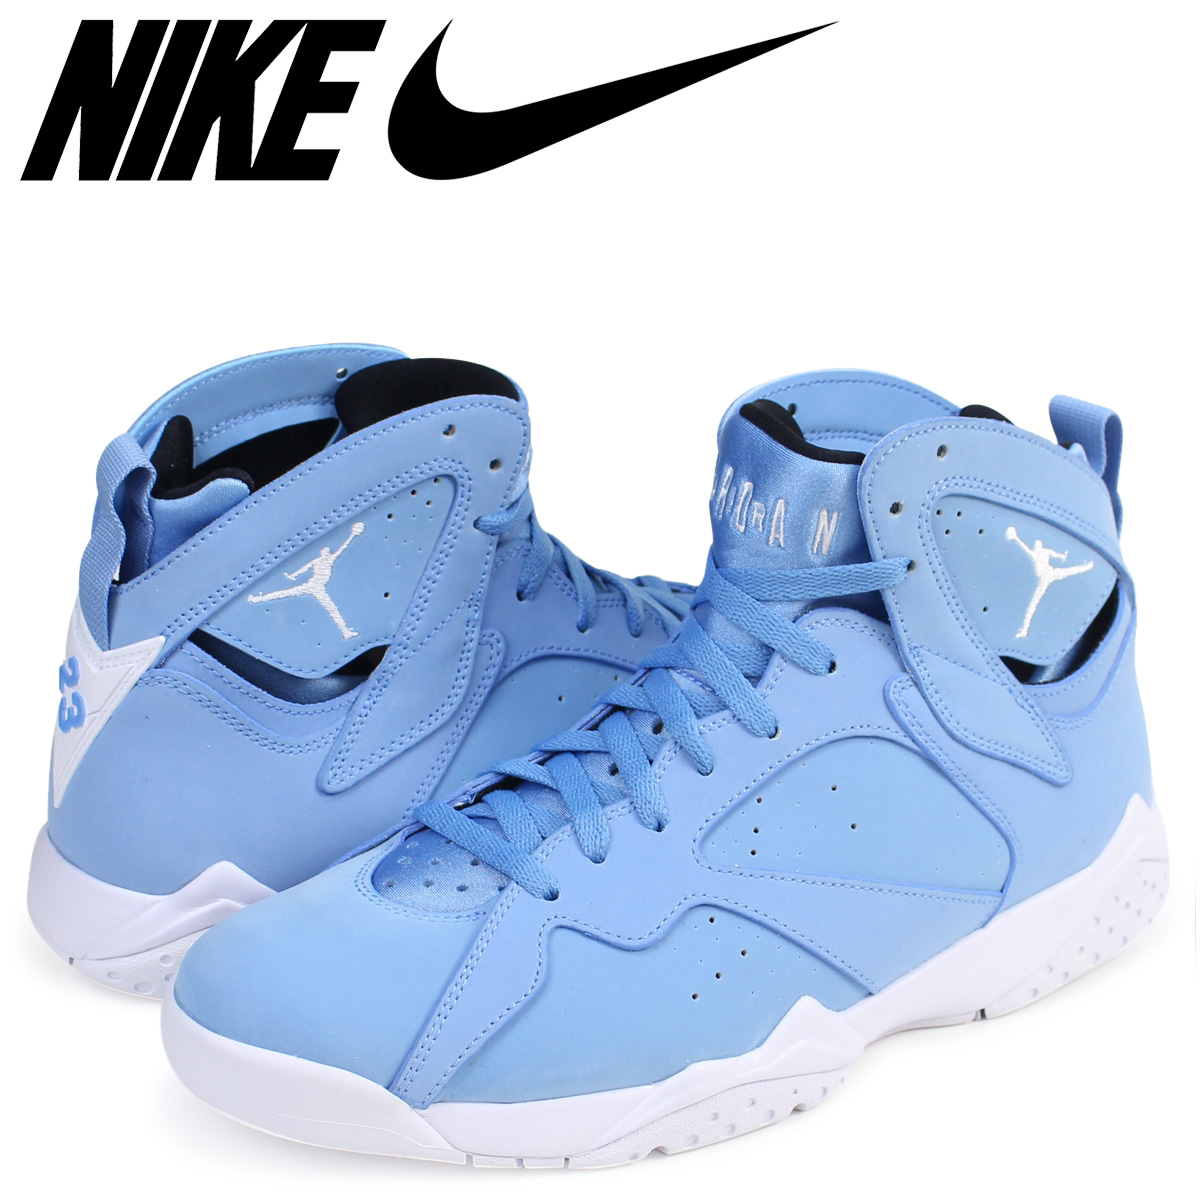 new product a59a7 11e61 NIKE Nike Air Jordan 7 nostalgic sneakers AIR JORDAN 7 RETRO PANTONE  304,775-400 men's shoes blue